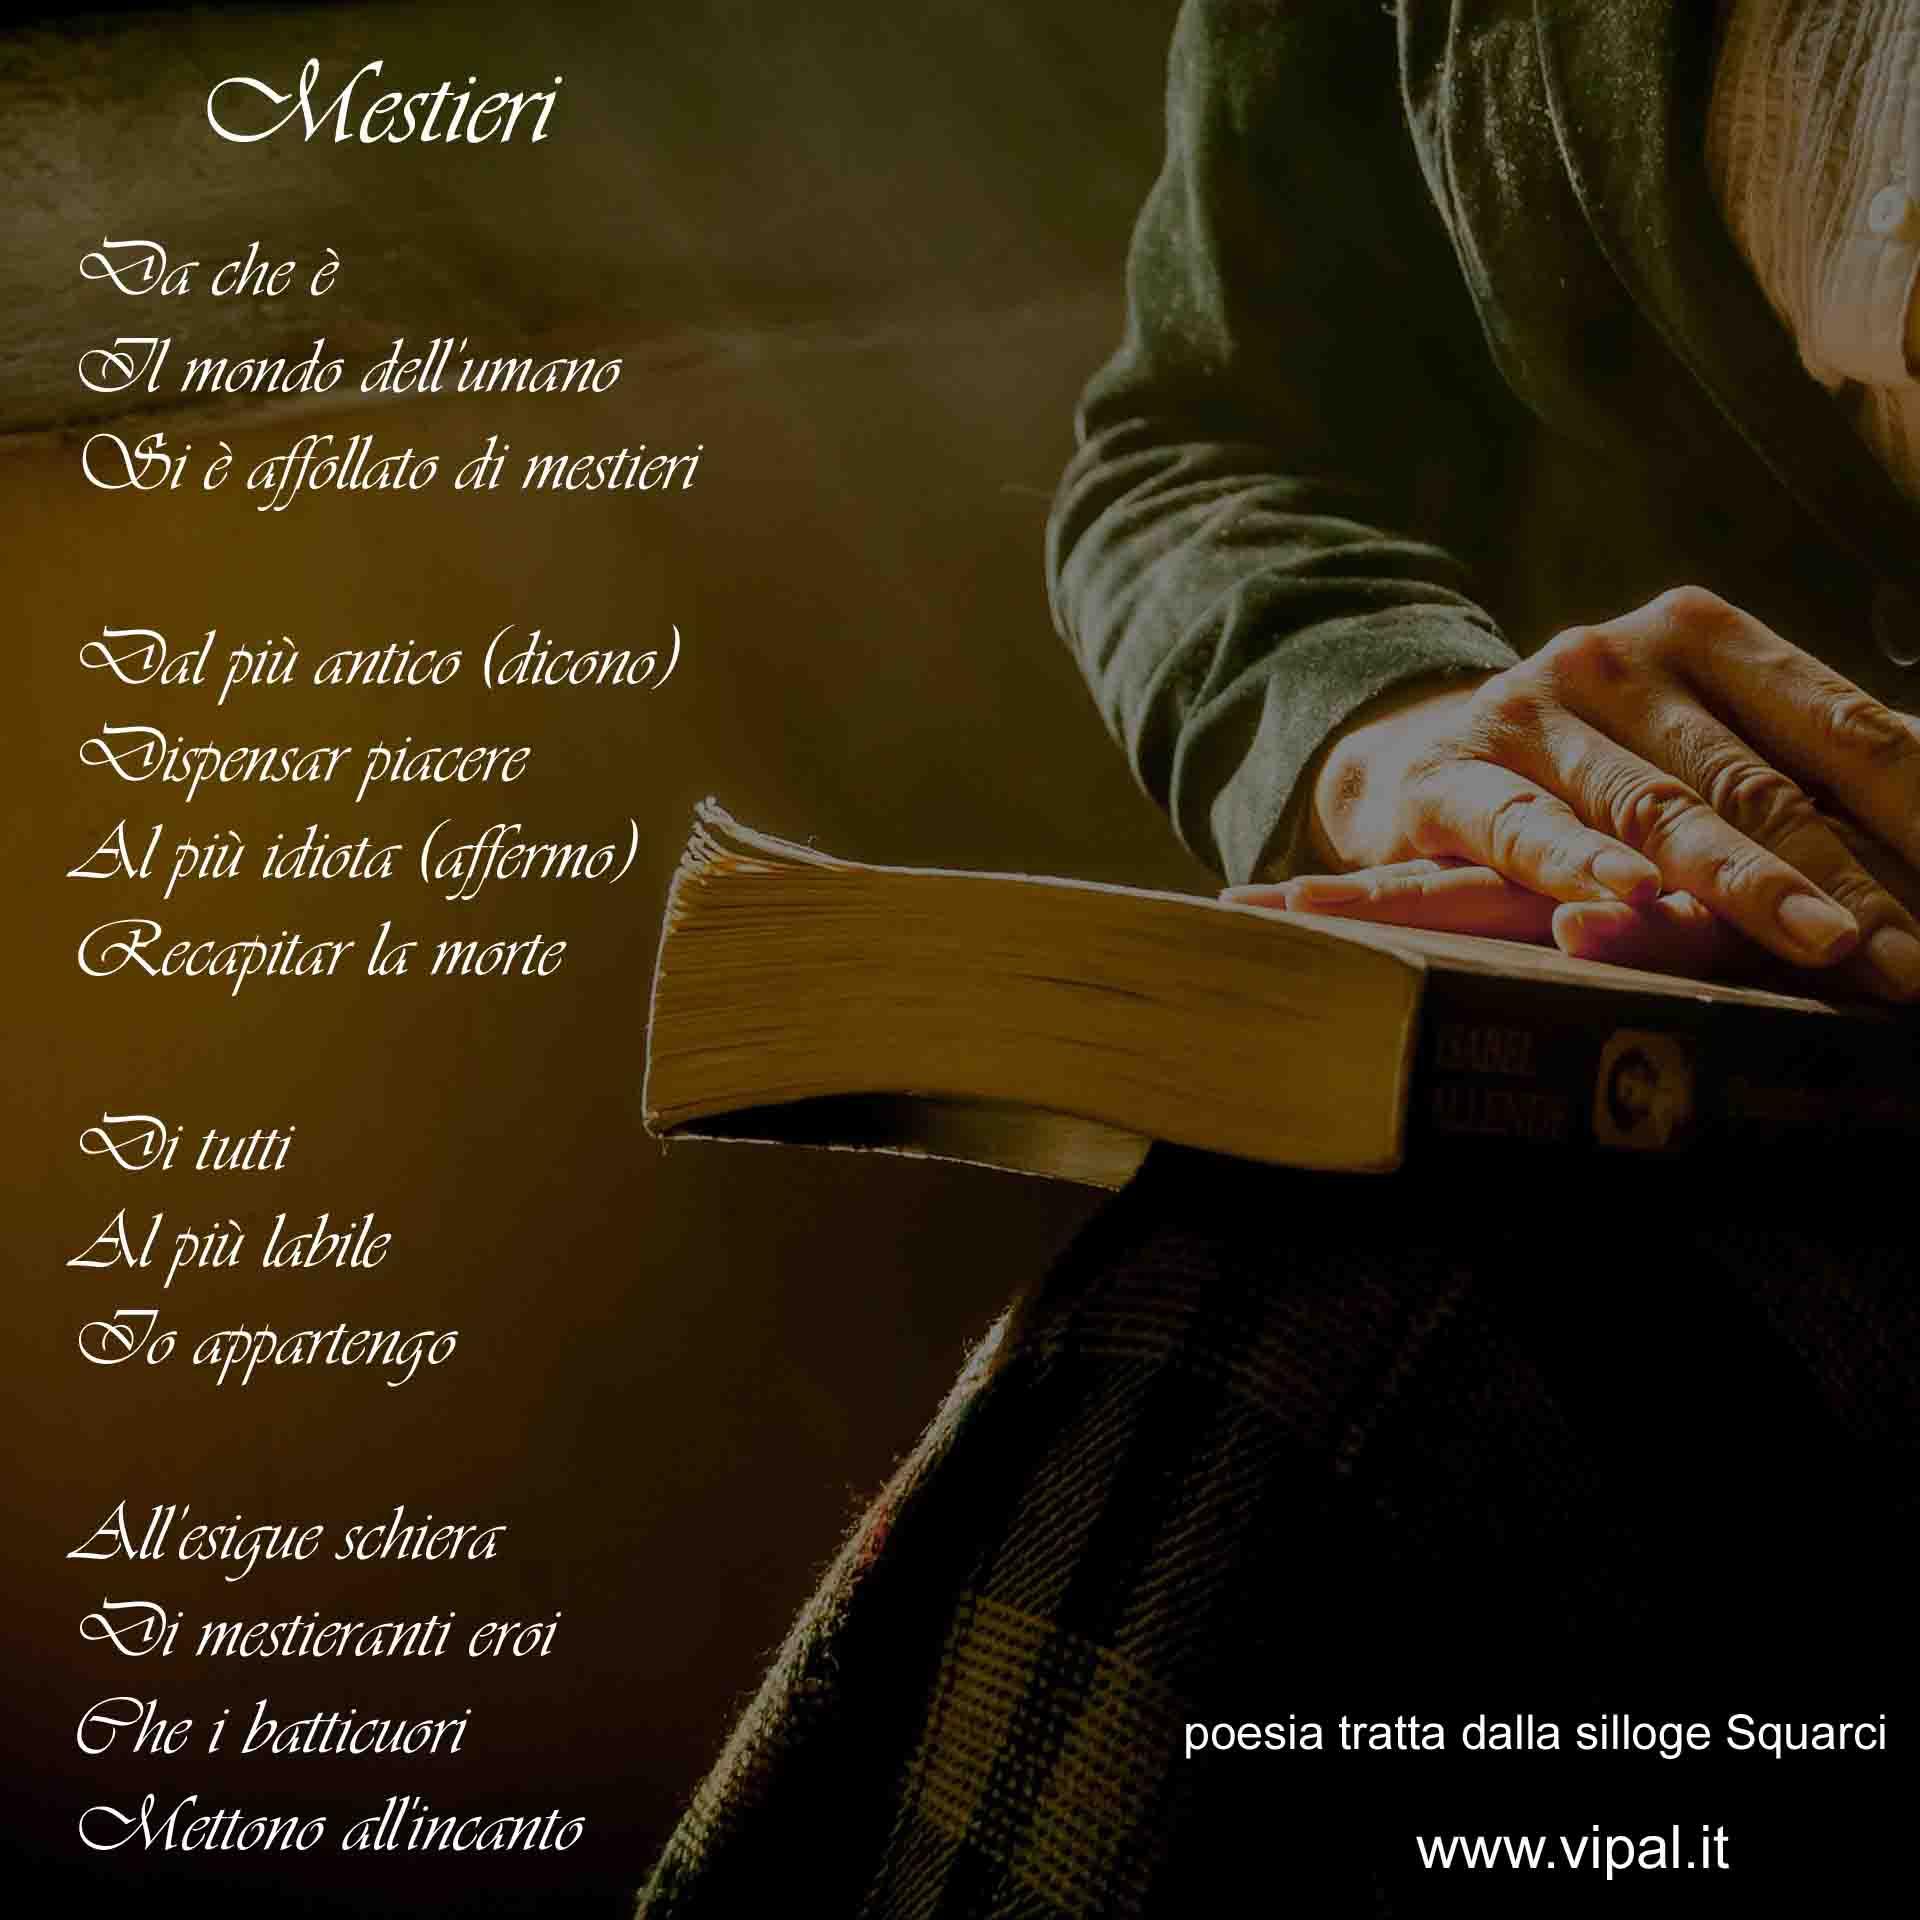 Mestieri testo poesia edita libro Squarci Vipal Antonio Gianfranco Gualdi